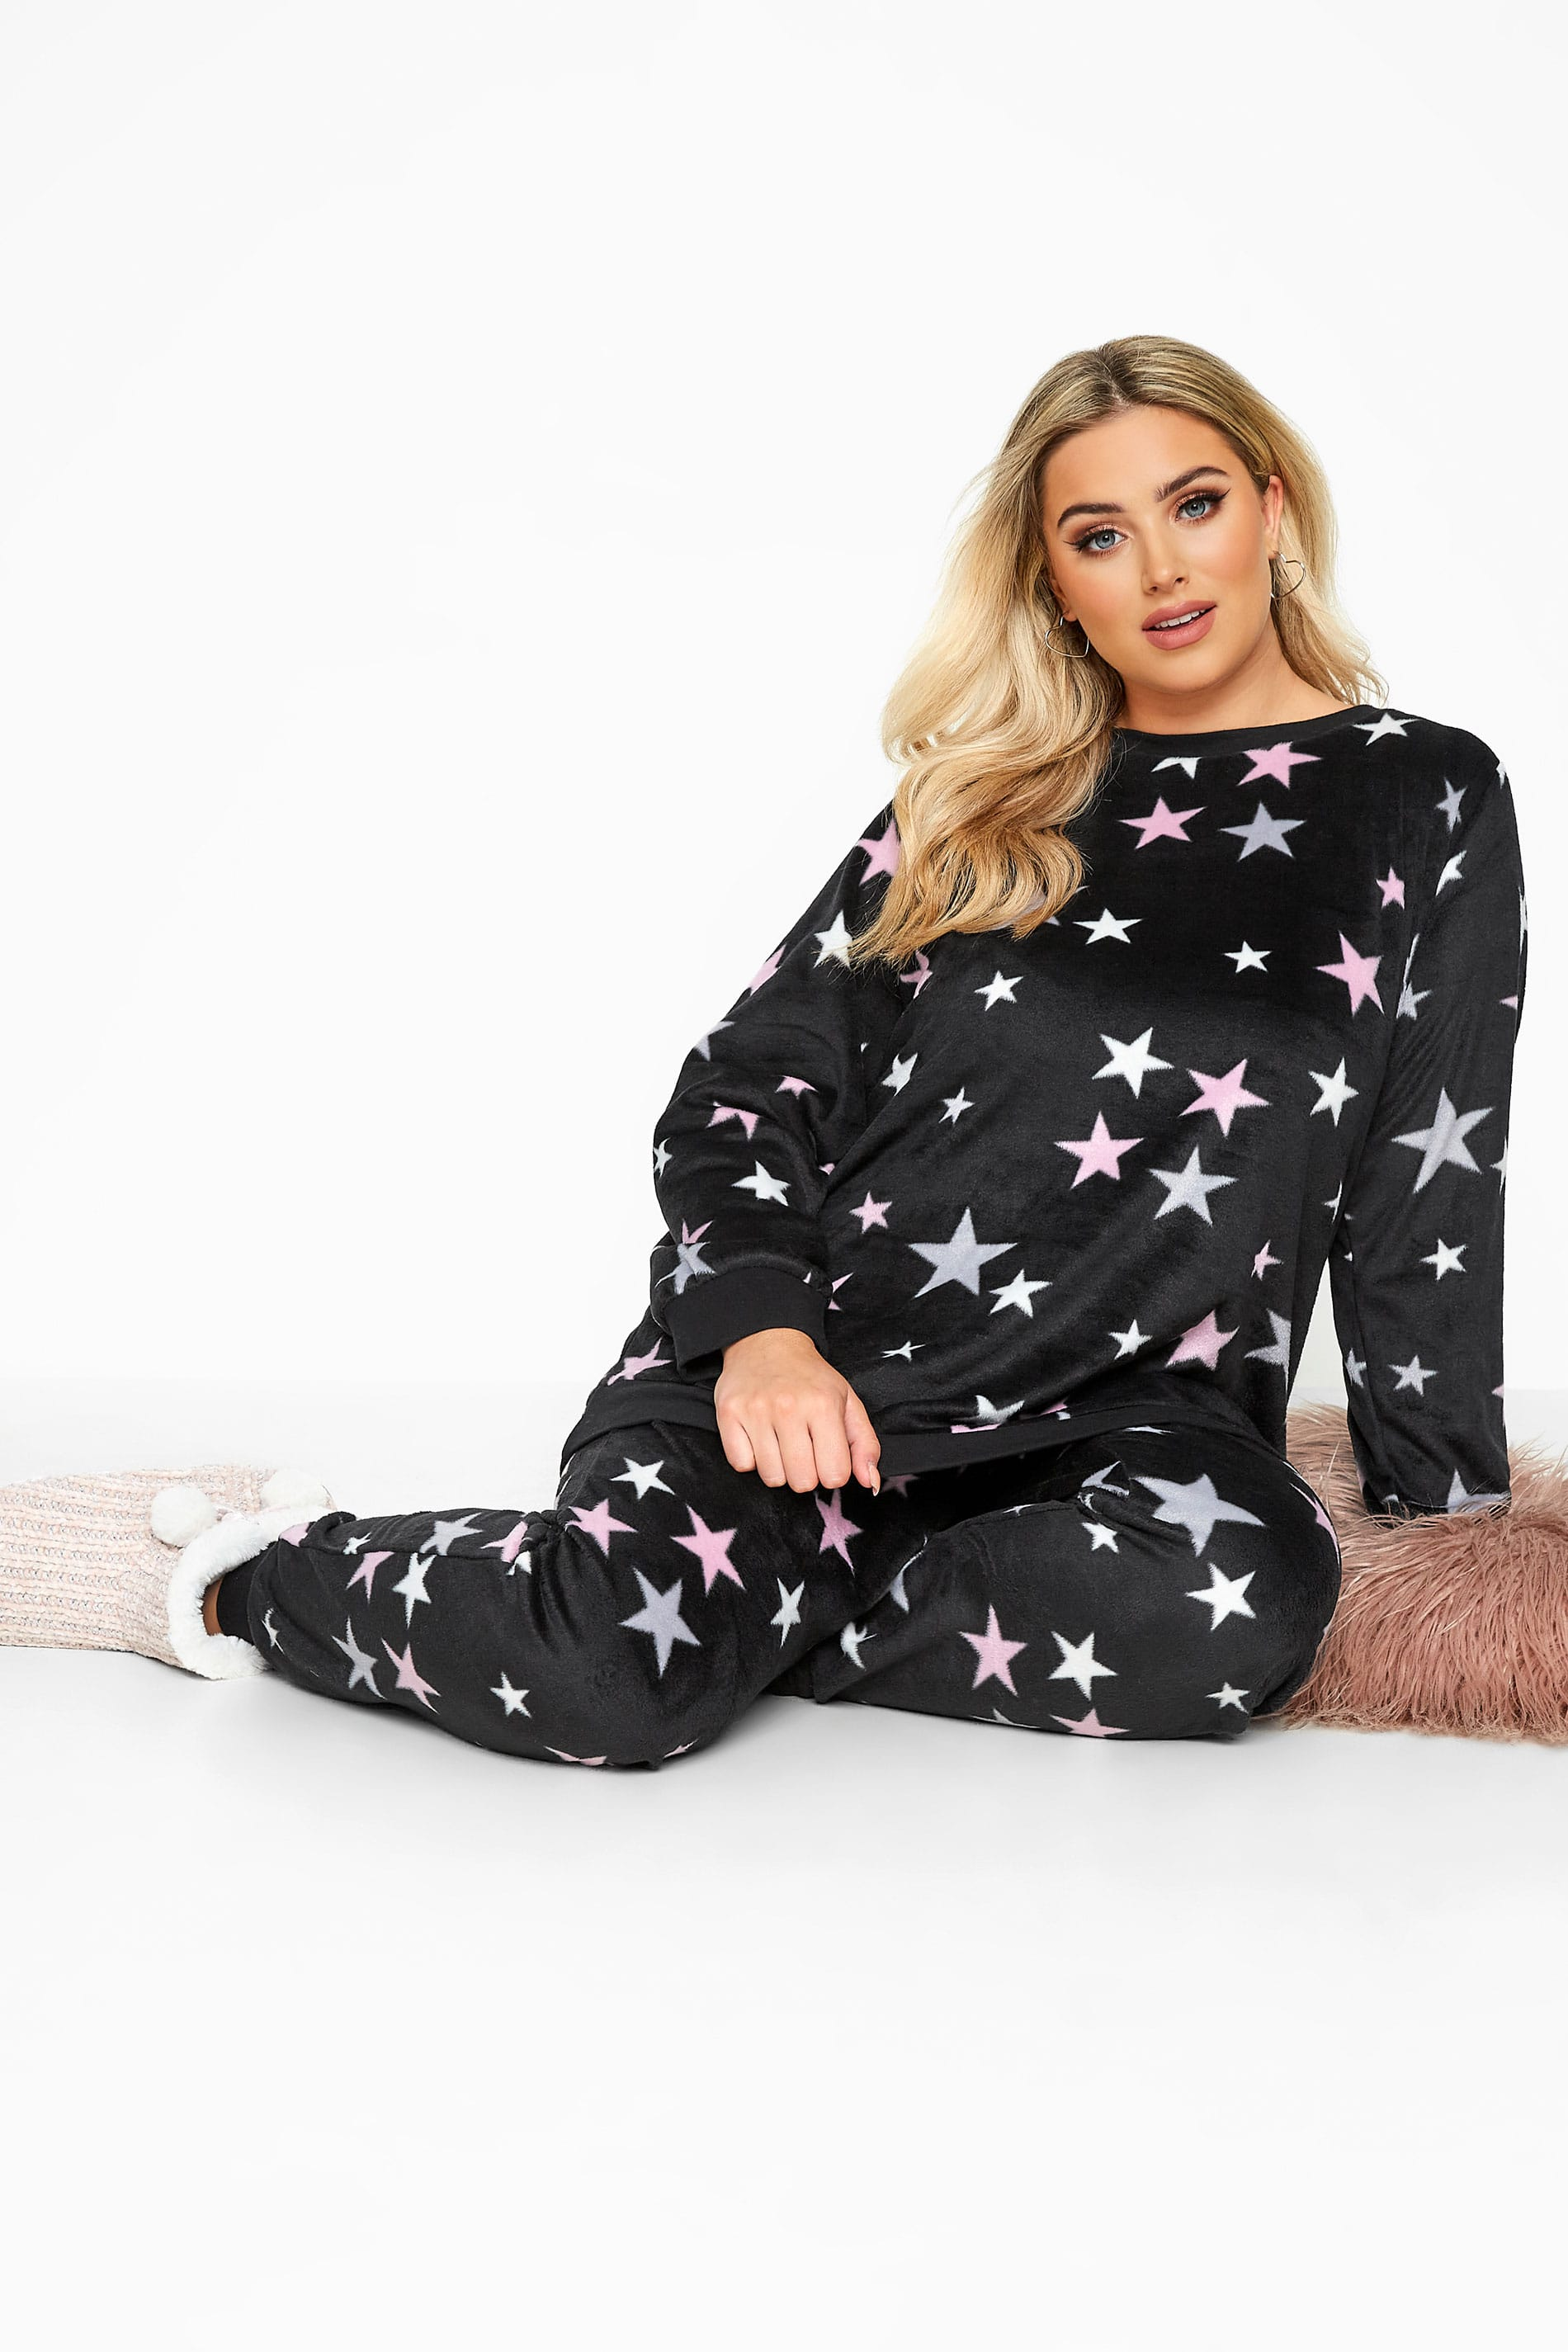 Black Star Fleece Lounge Set